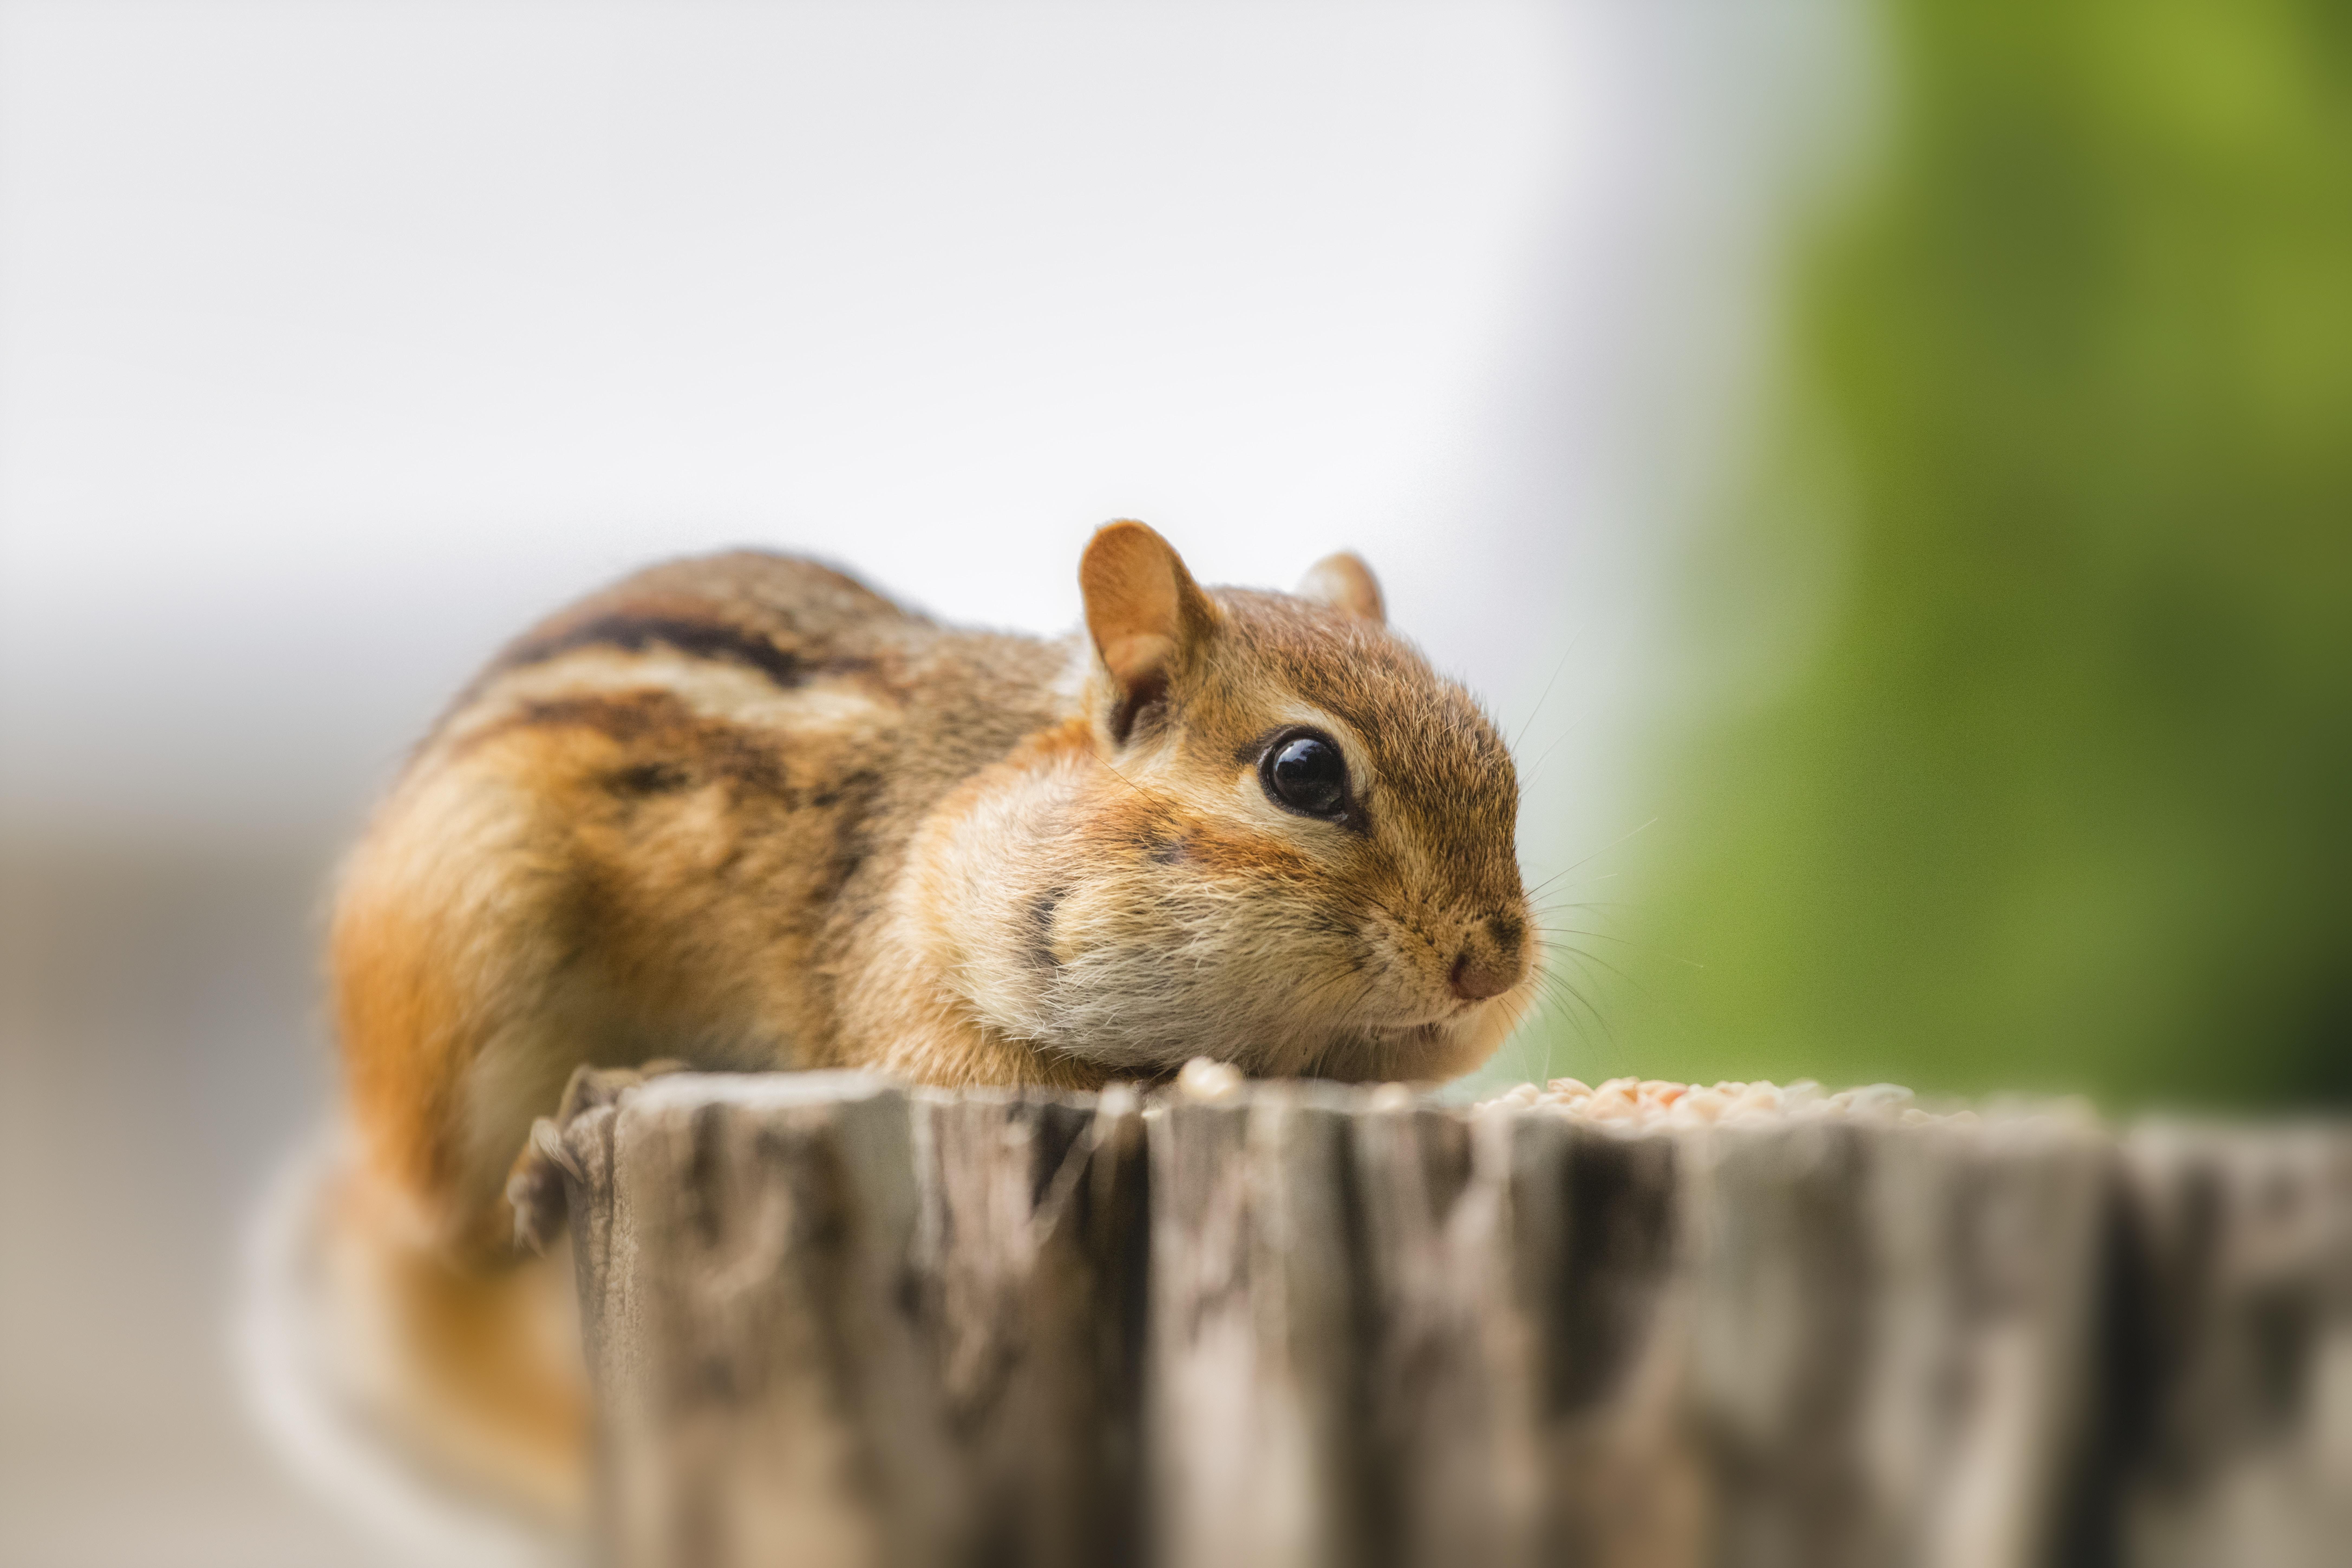 squirrel on brown wood